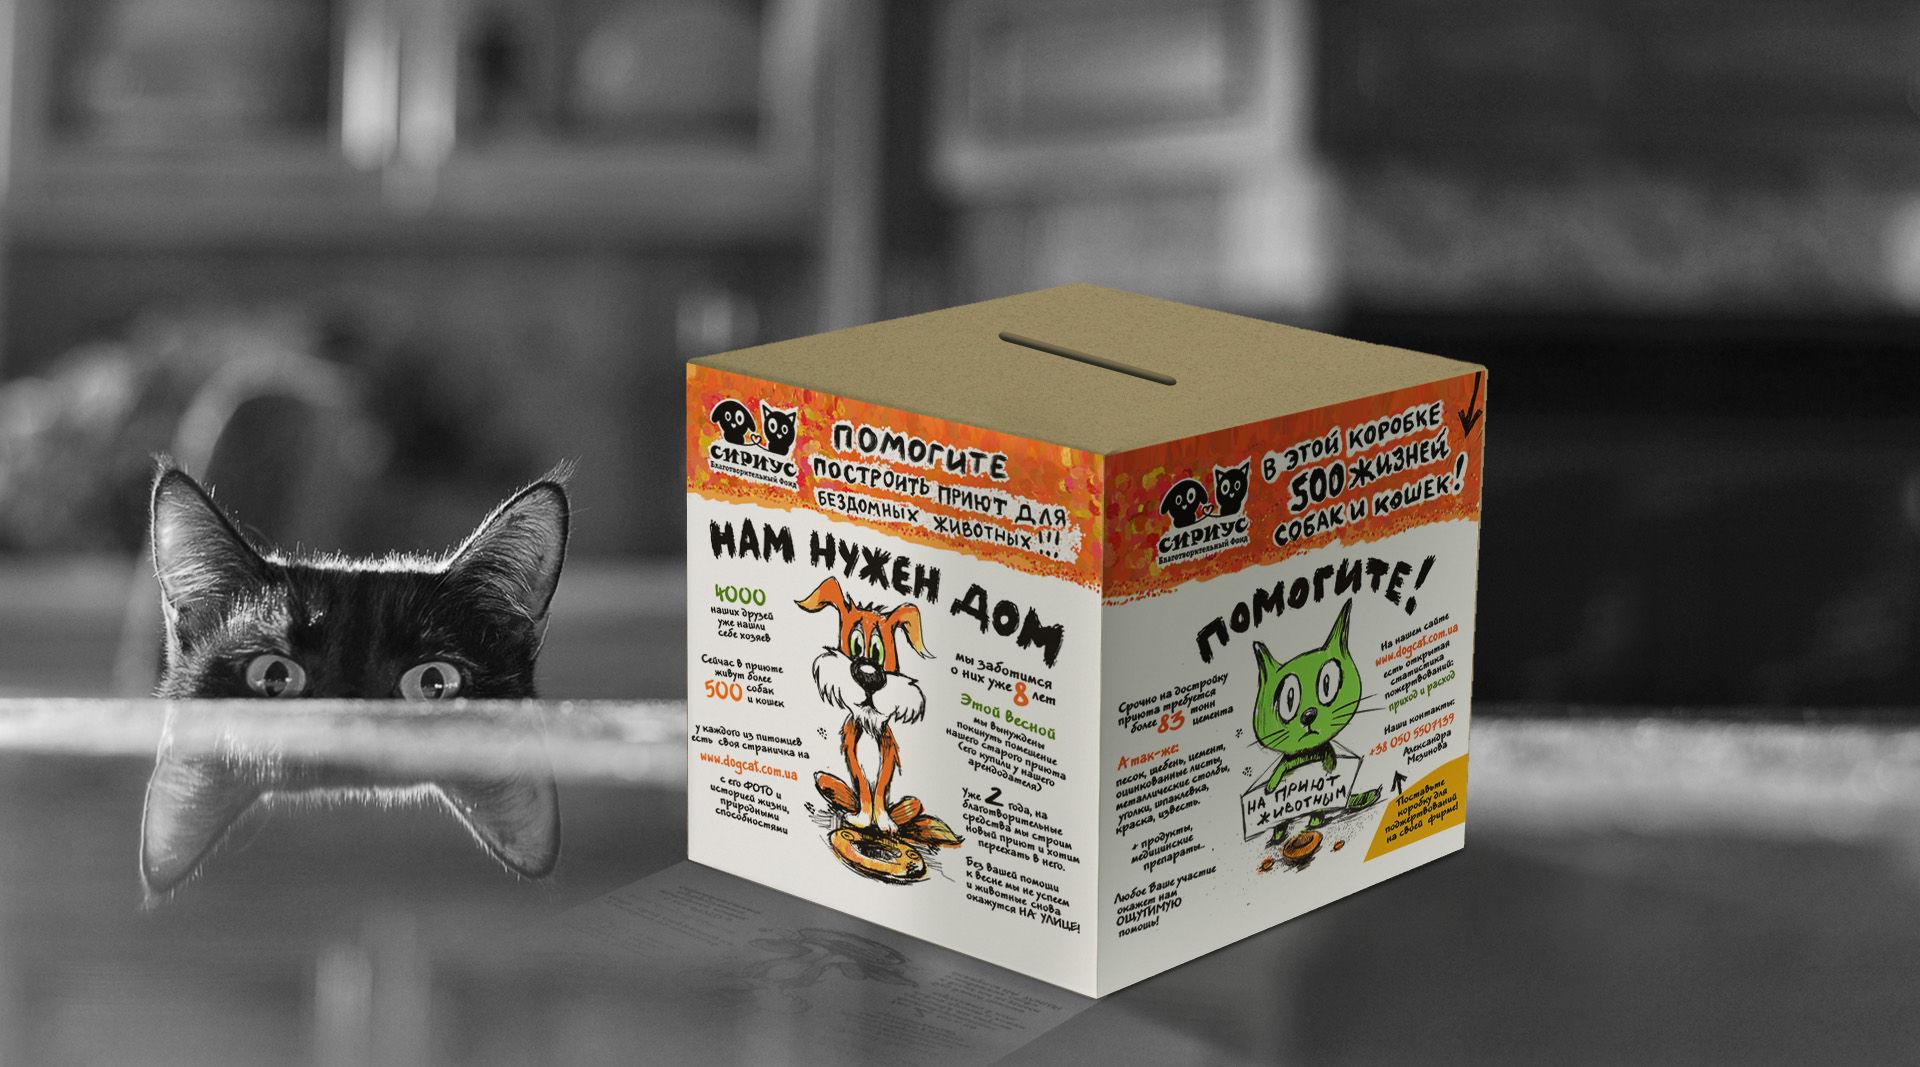 Дизайн коробки для пожертвований для приюта домашних животных, Animal shelter donate box design